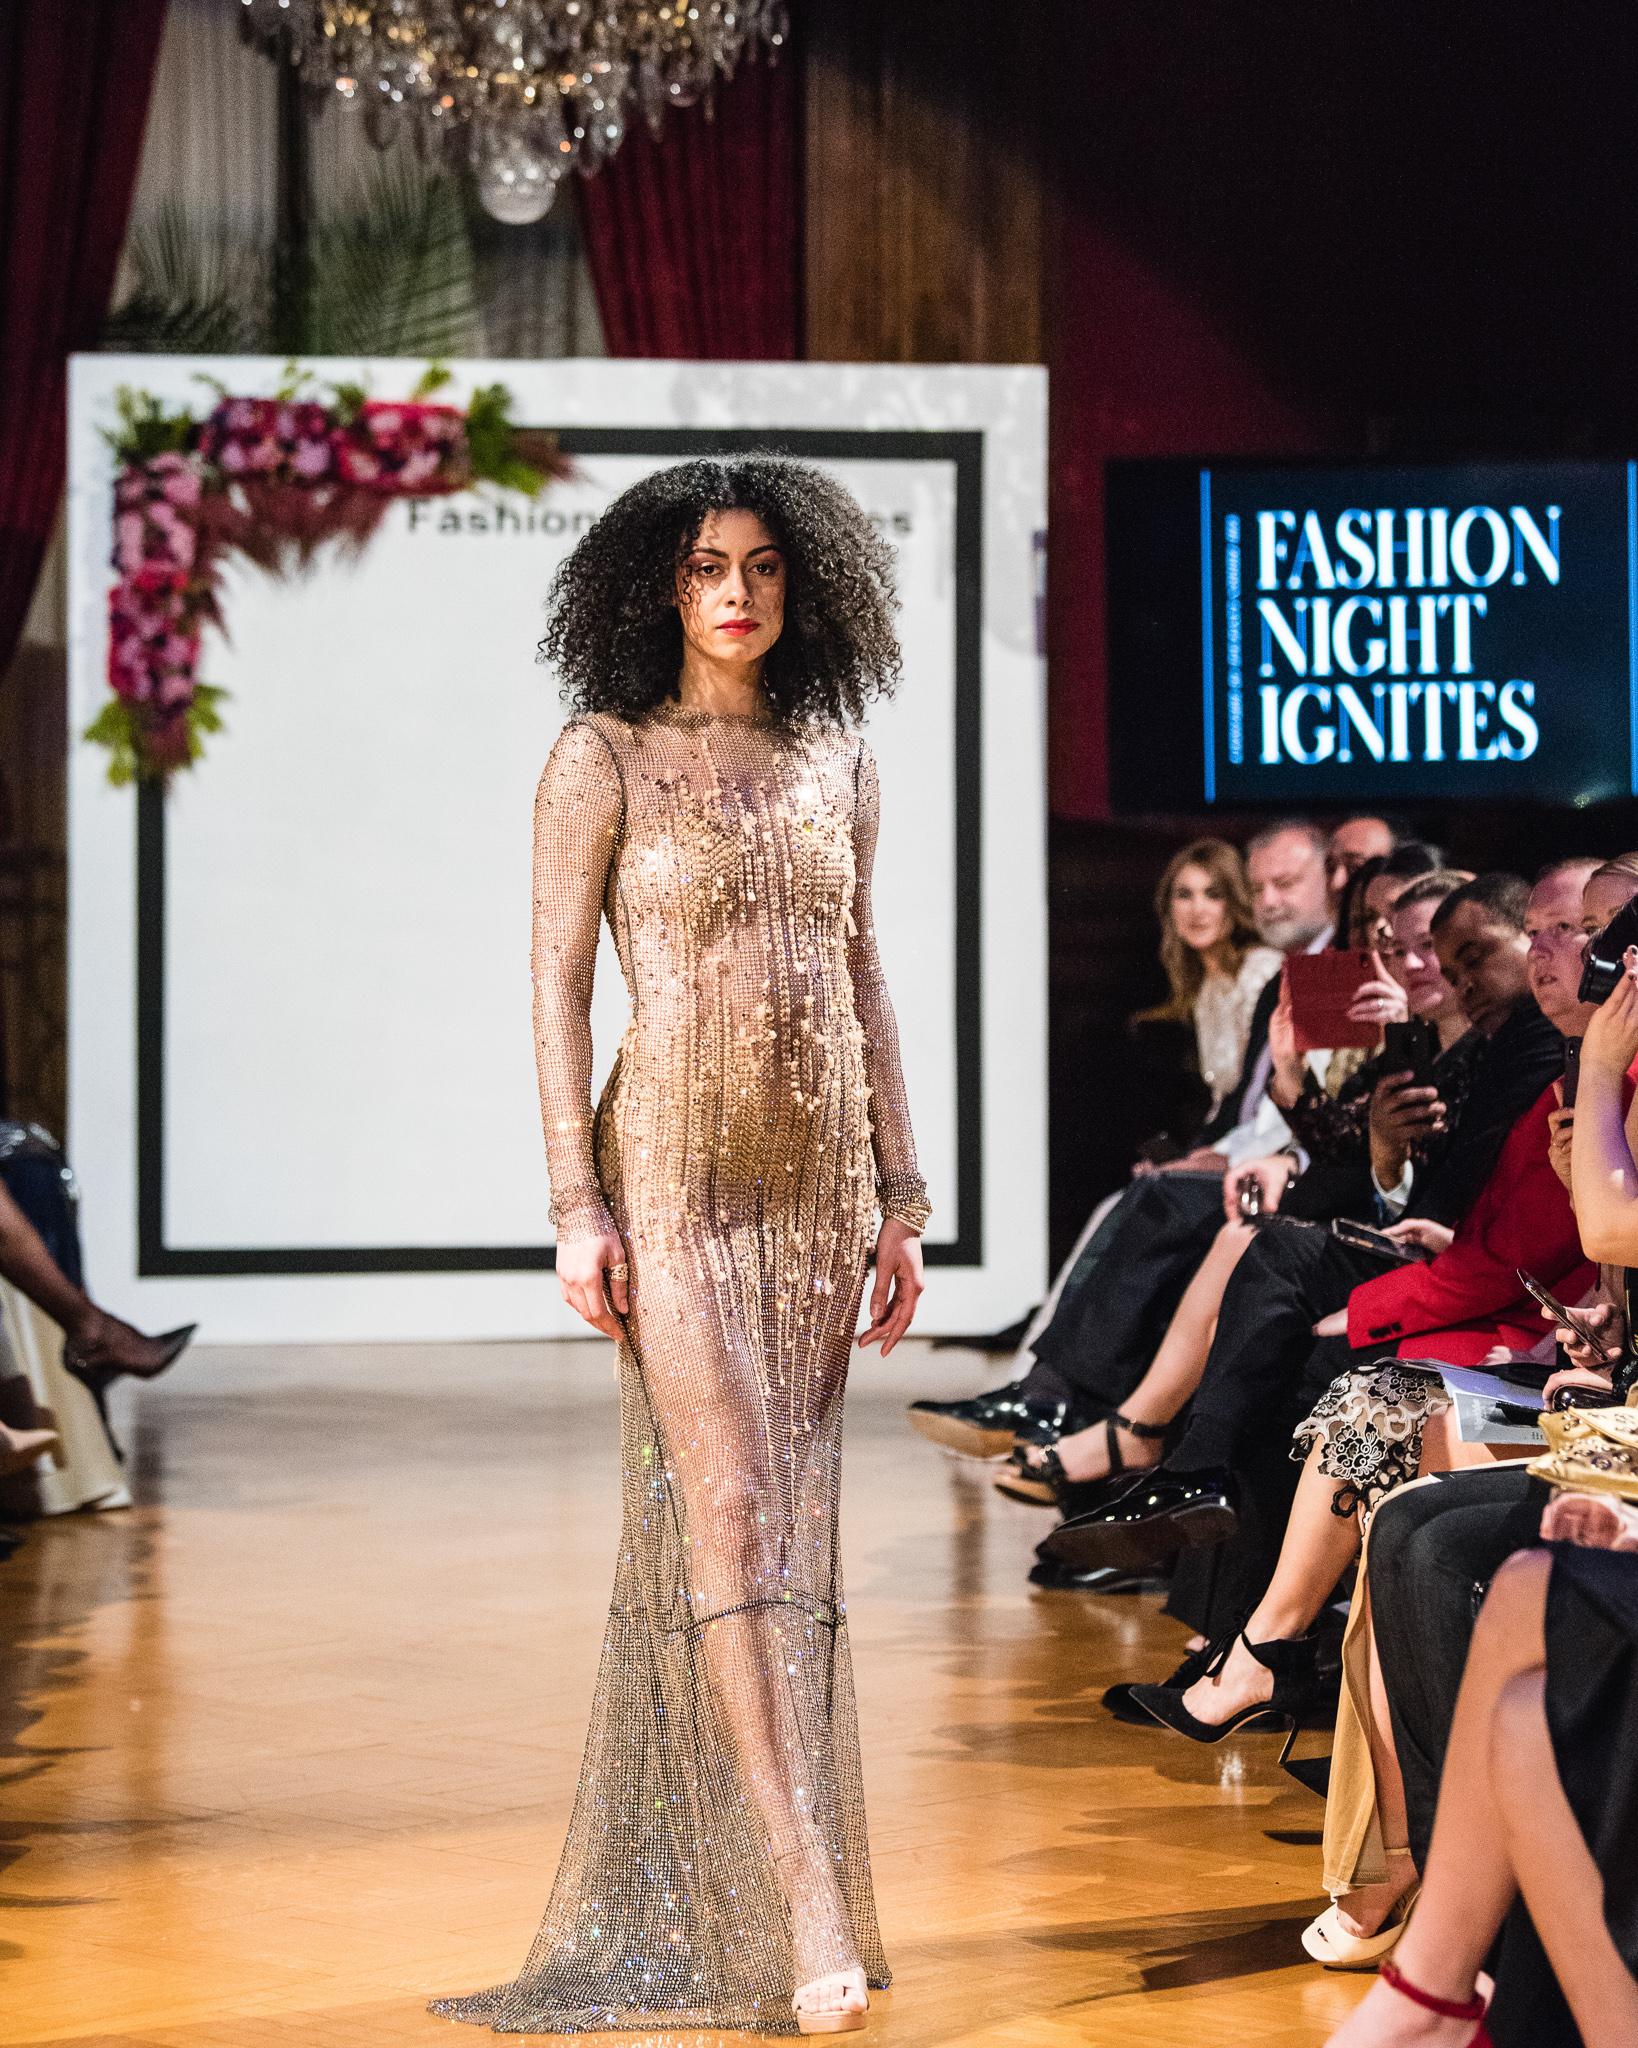 TypeA_FashionNightIgnites_Poner_dress.jpg